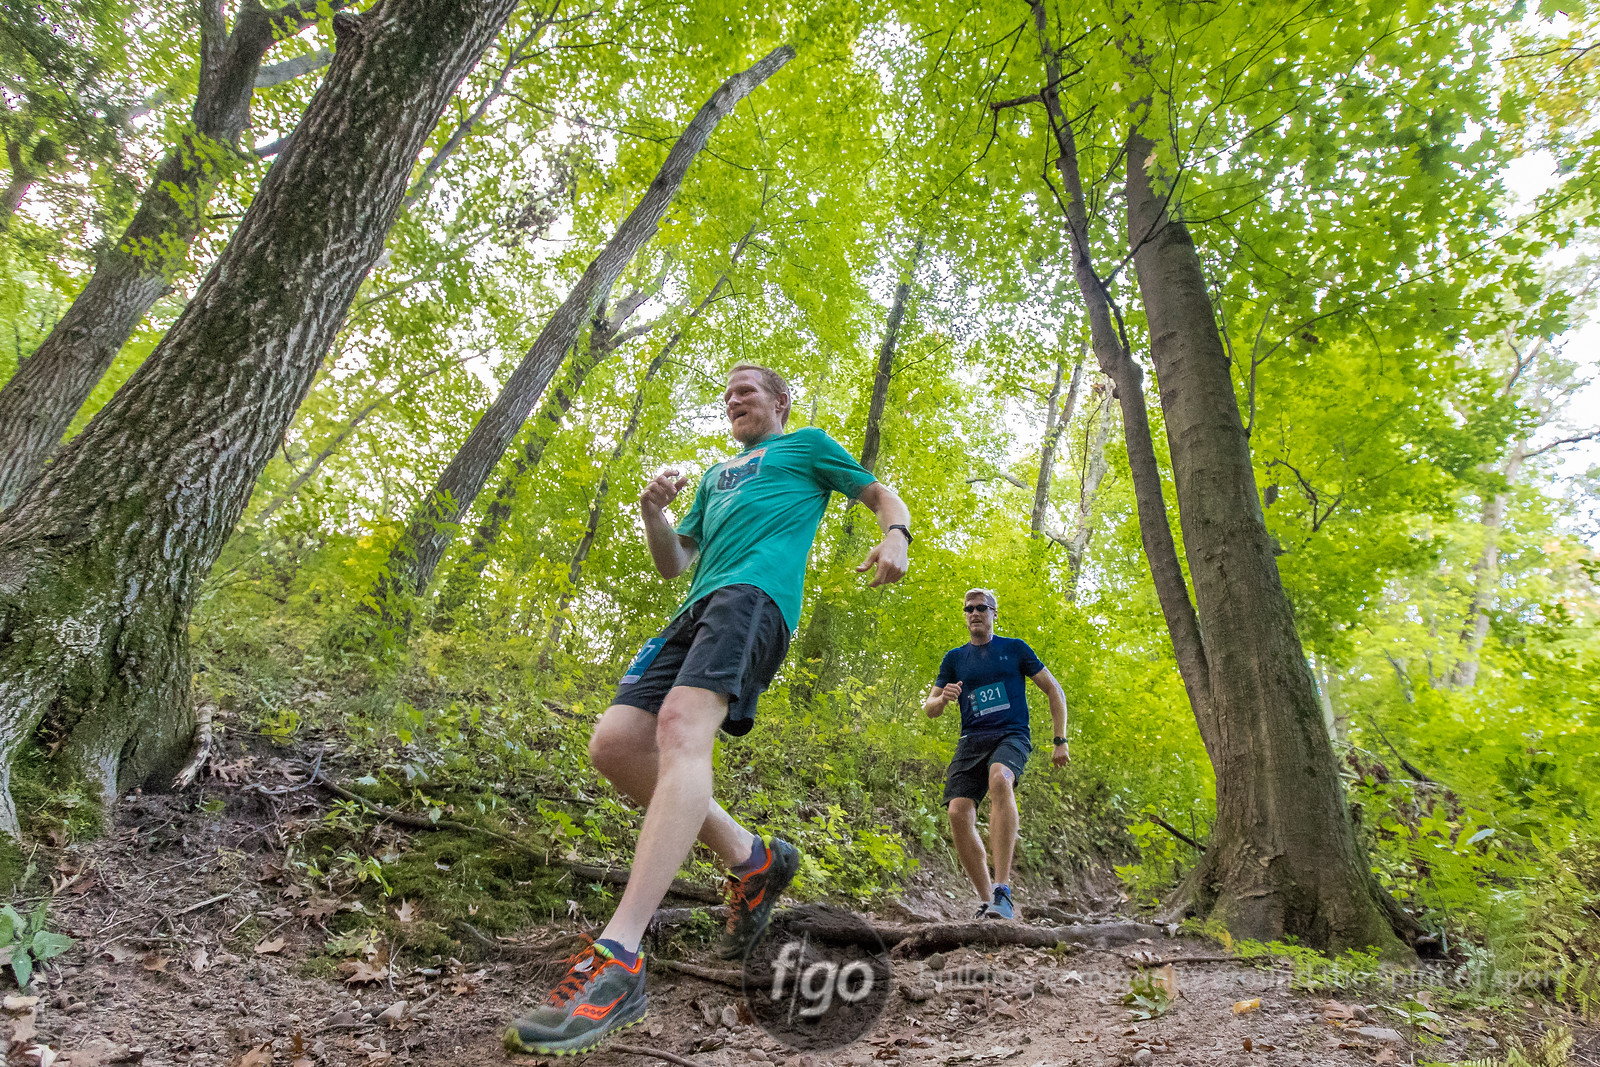 2017 Surly Trail Loppet in Minneapolis, Minnesota on September 23, 2017